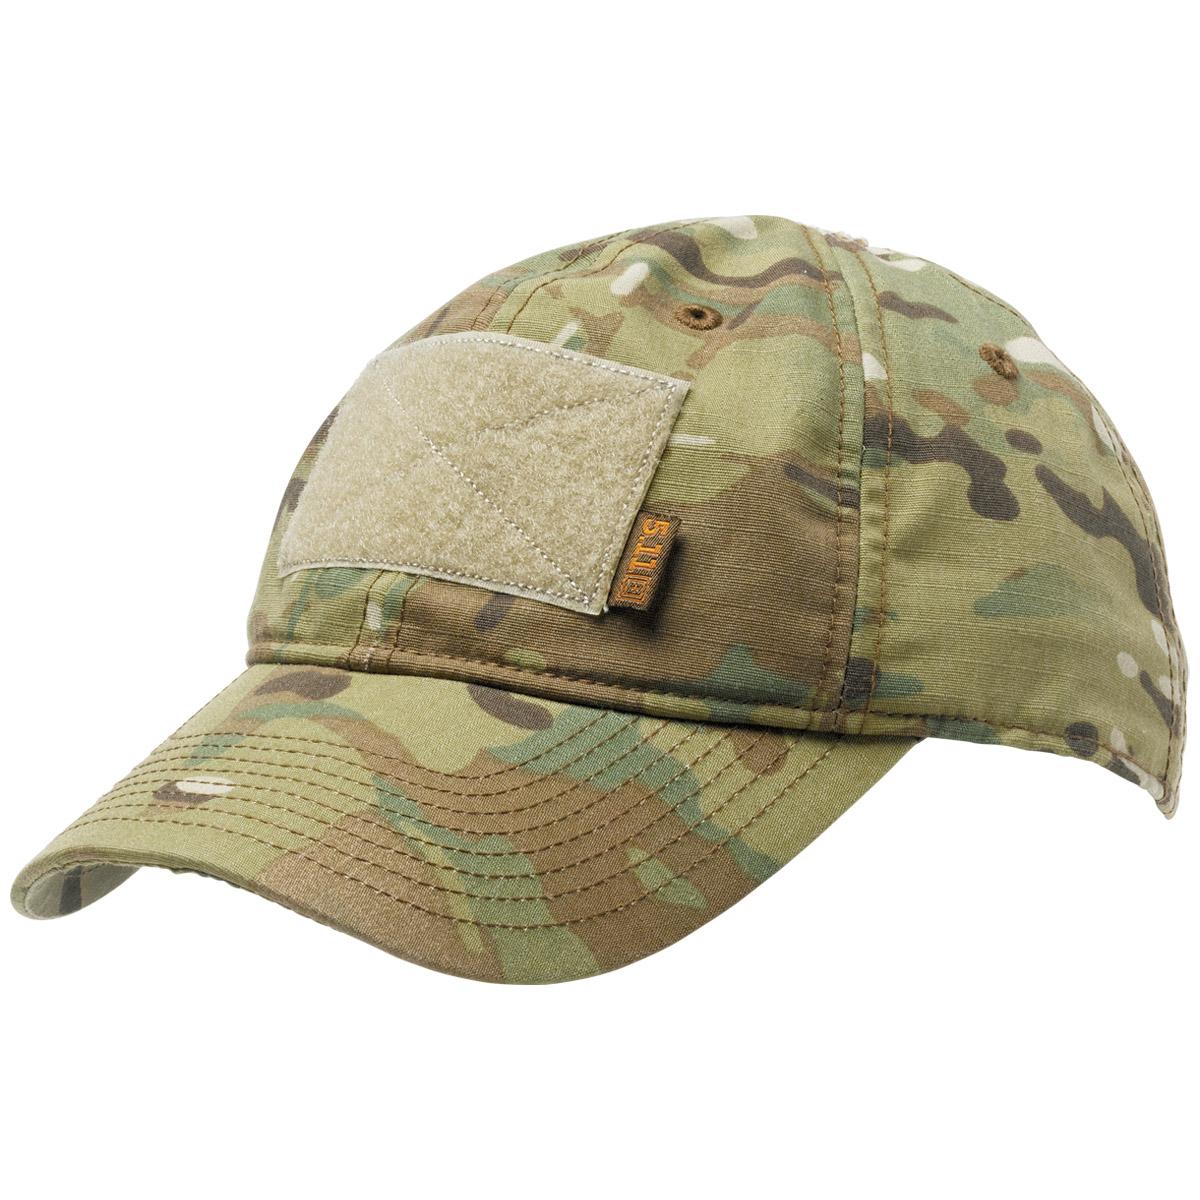 5 11 tactical flag bearer baseball cap army